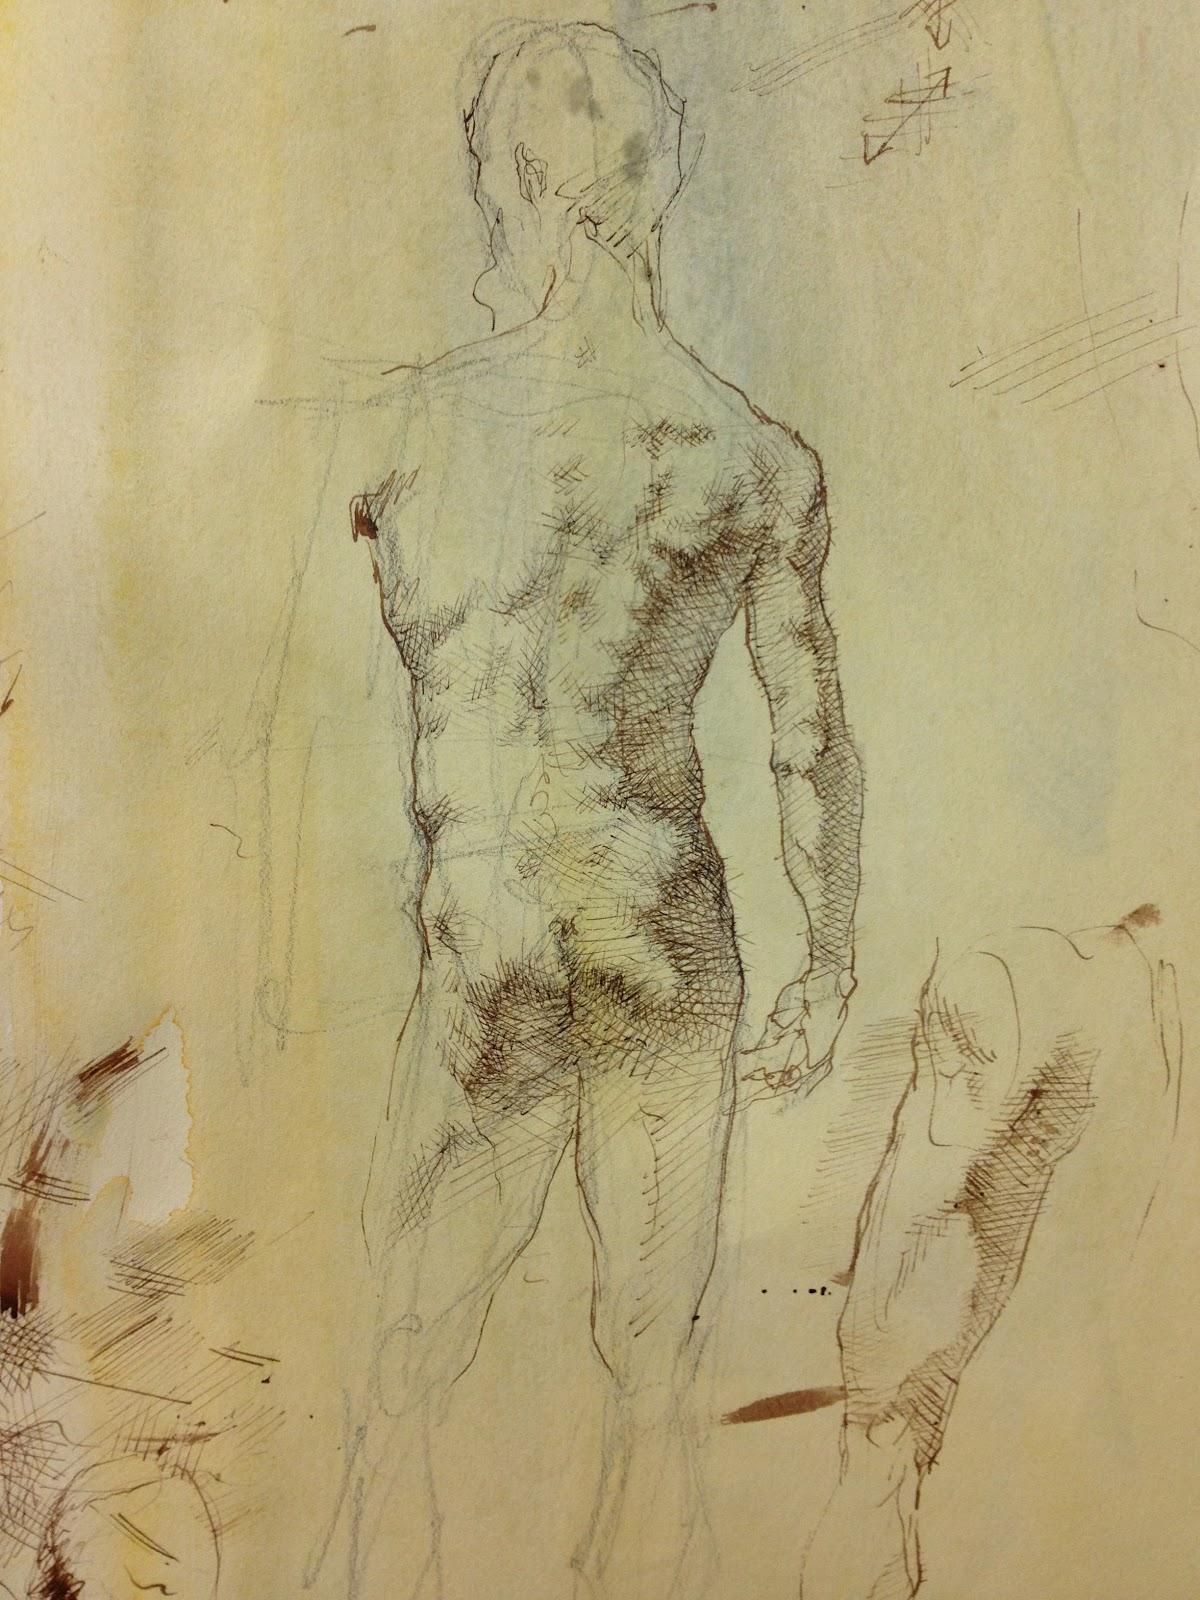 1200x1600 Marie Dauenheimer's Art And Anatomy Blog Drawing The Figure